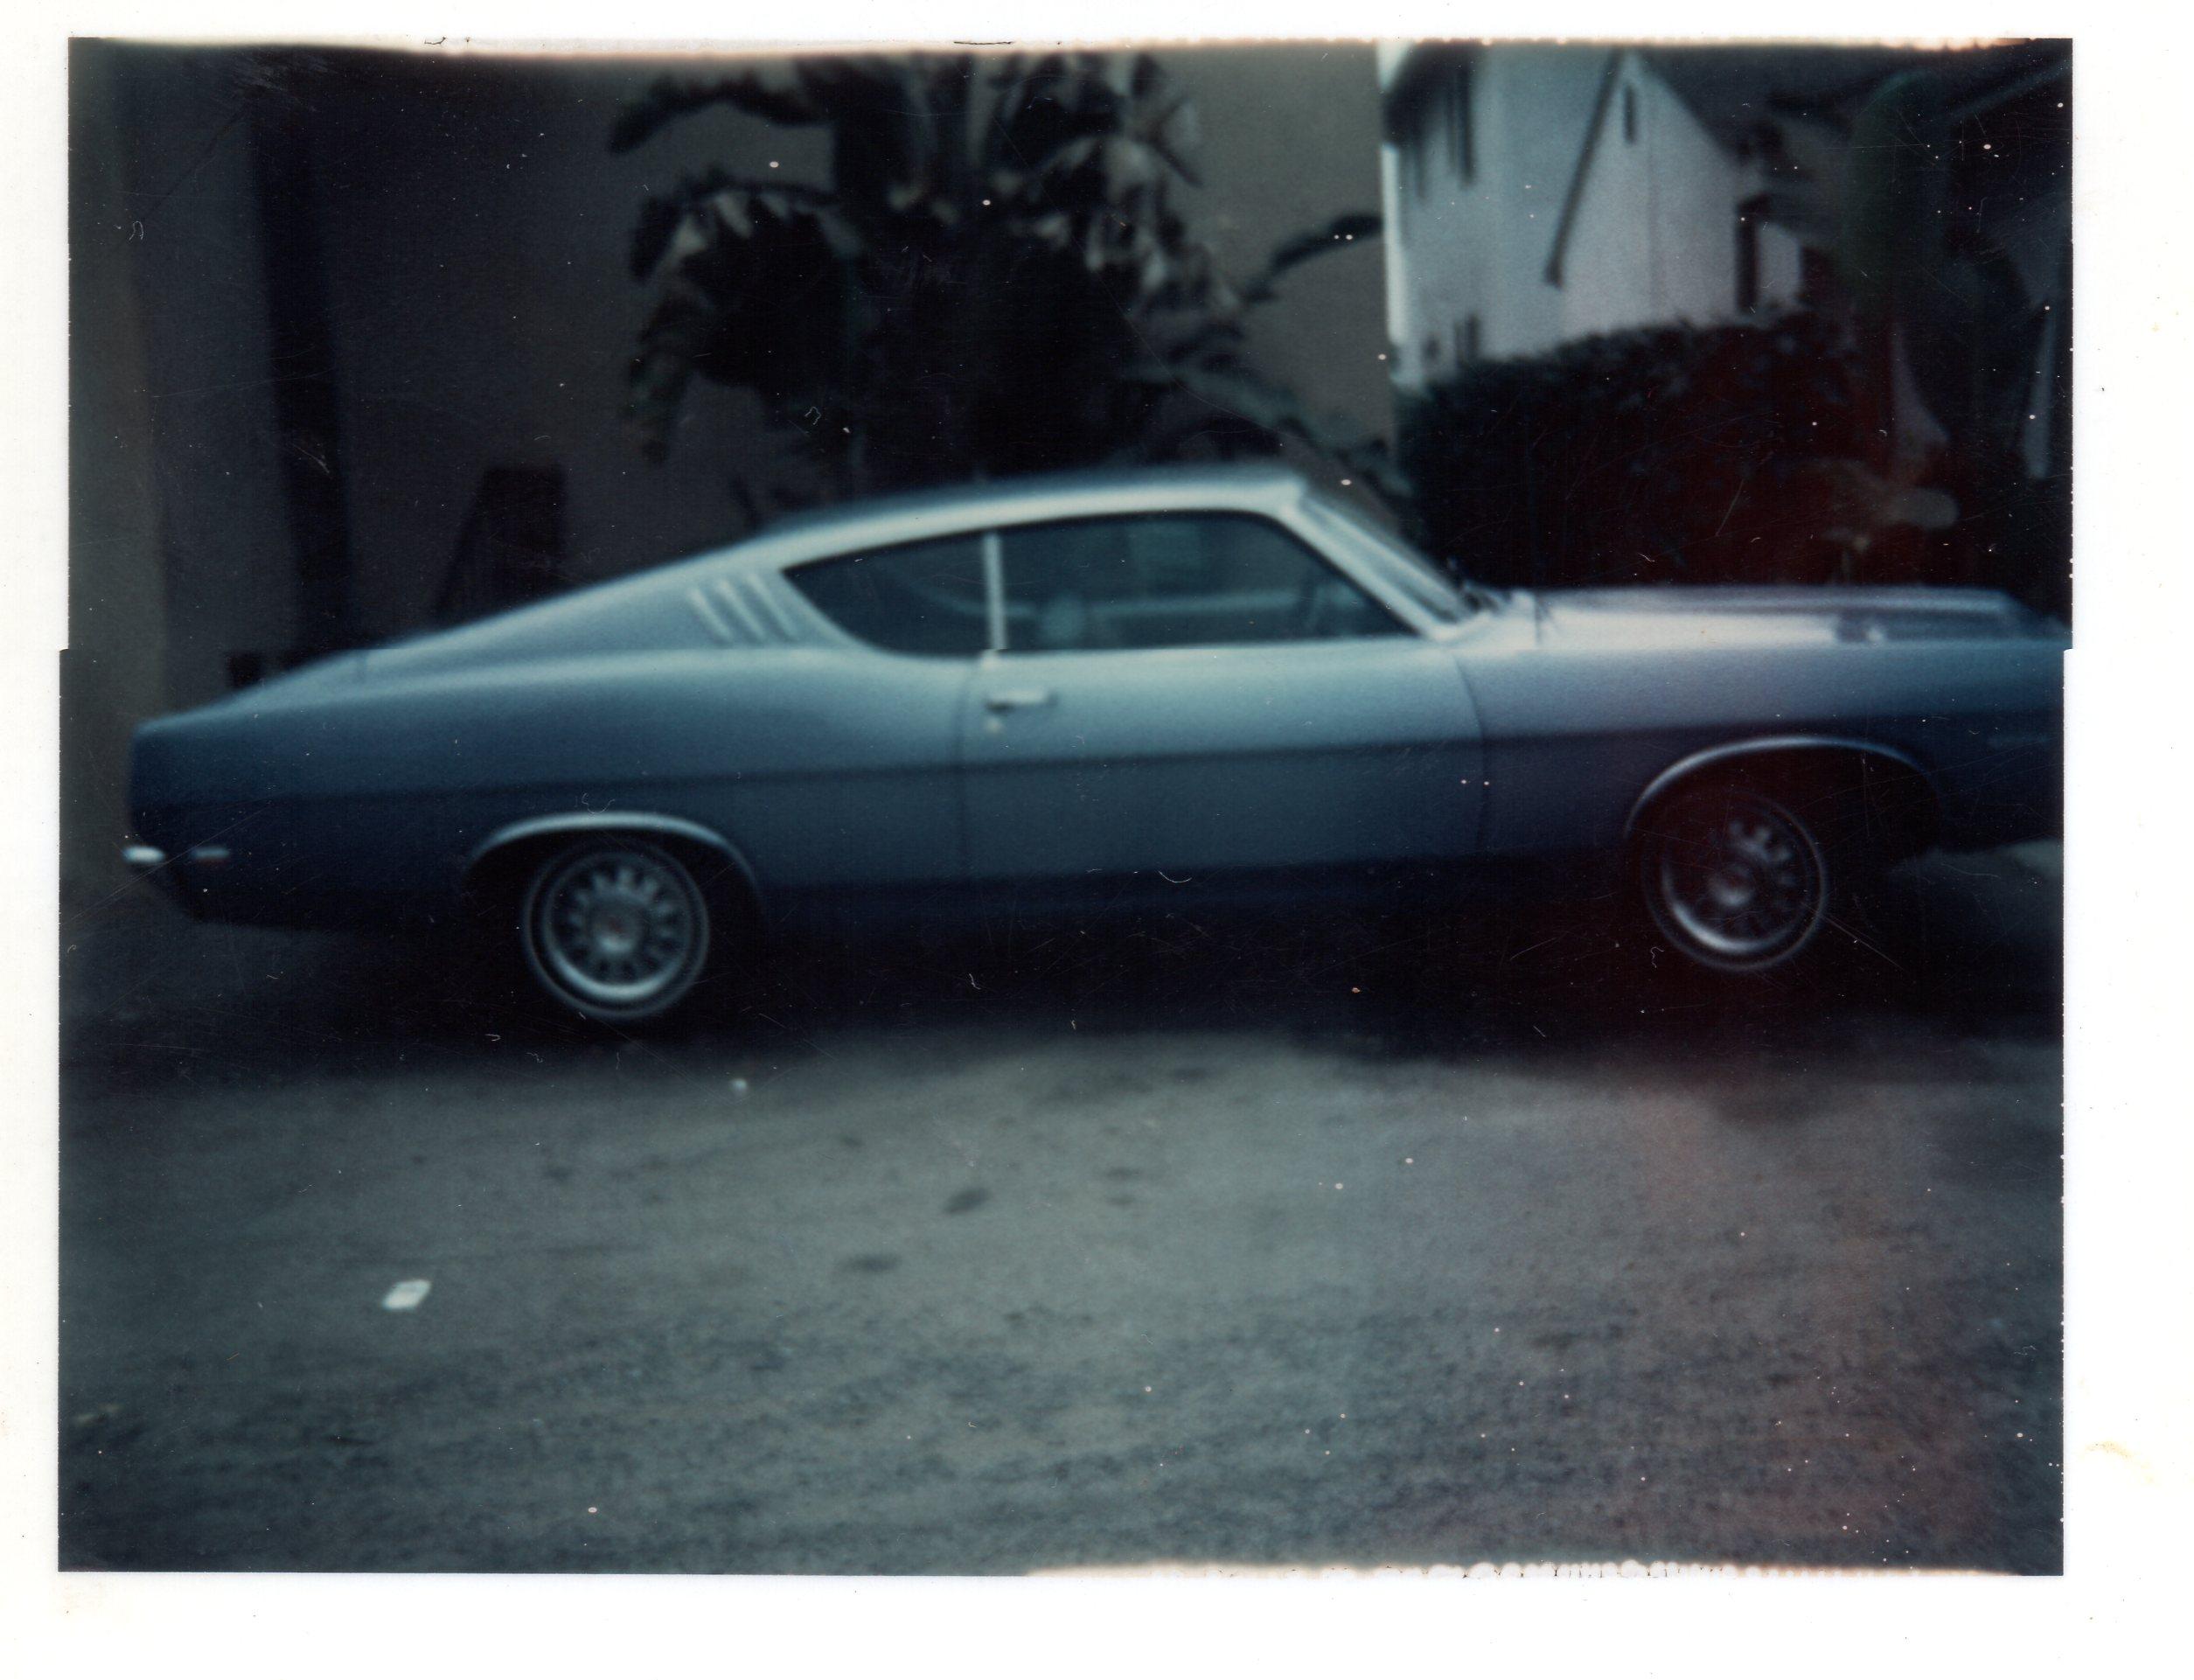 1969 Ford Torino side profile